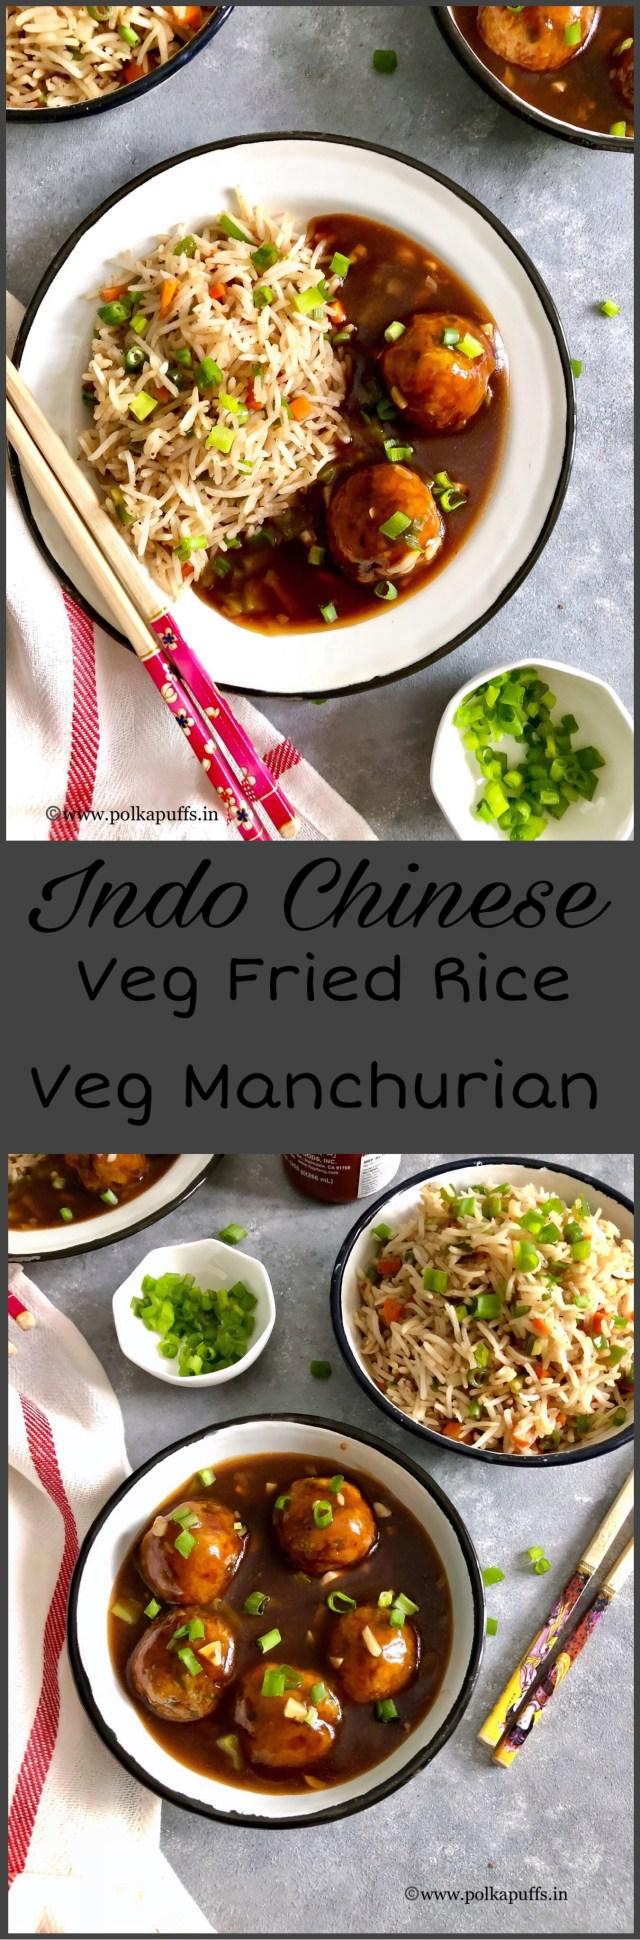 Veg Fried Rice | How to make Veg Fried Rice | GF & Vegan